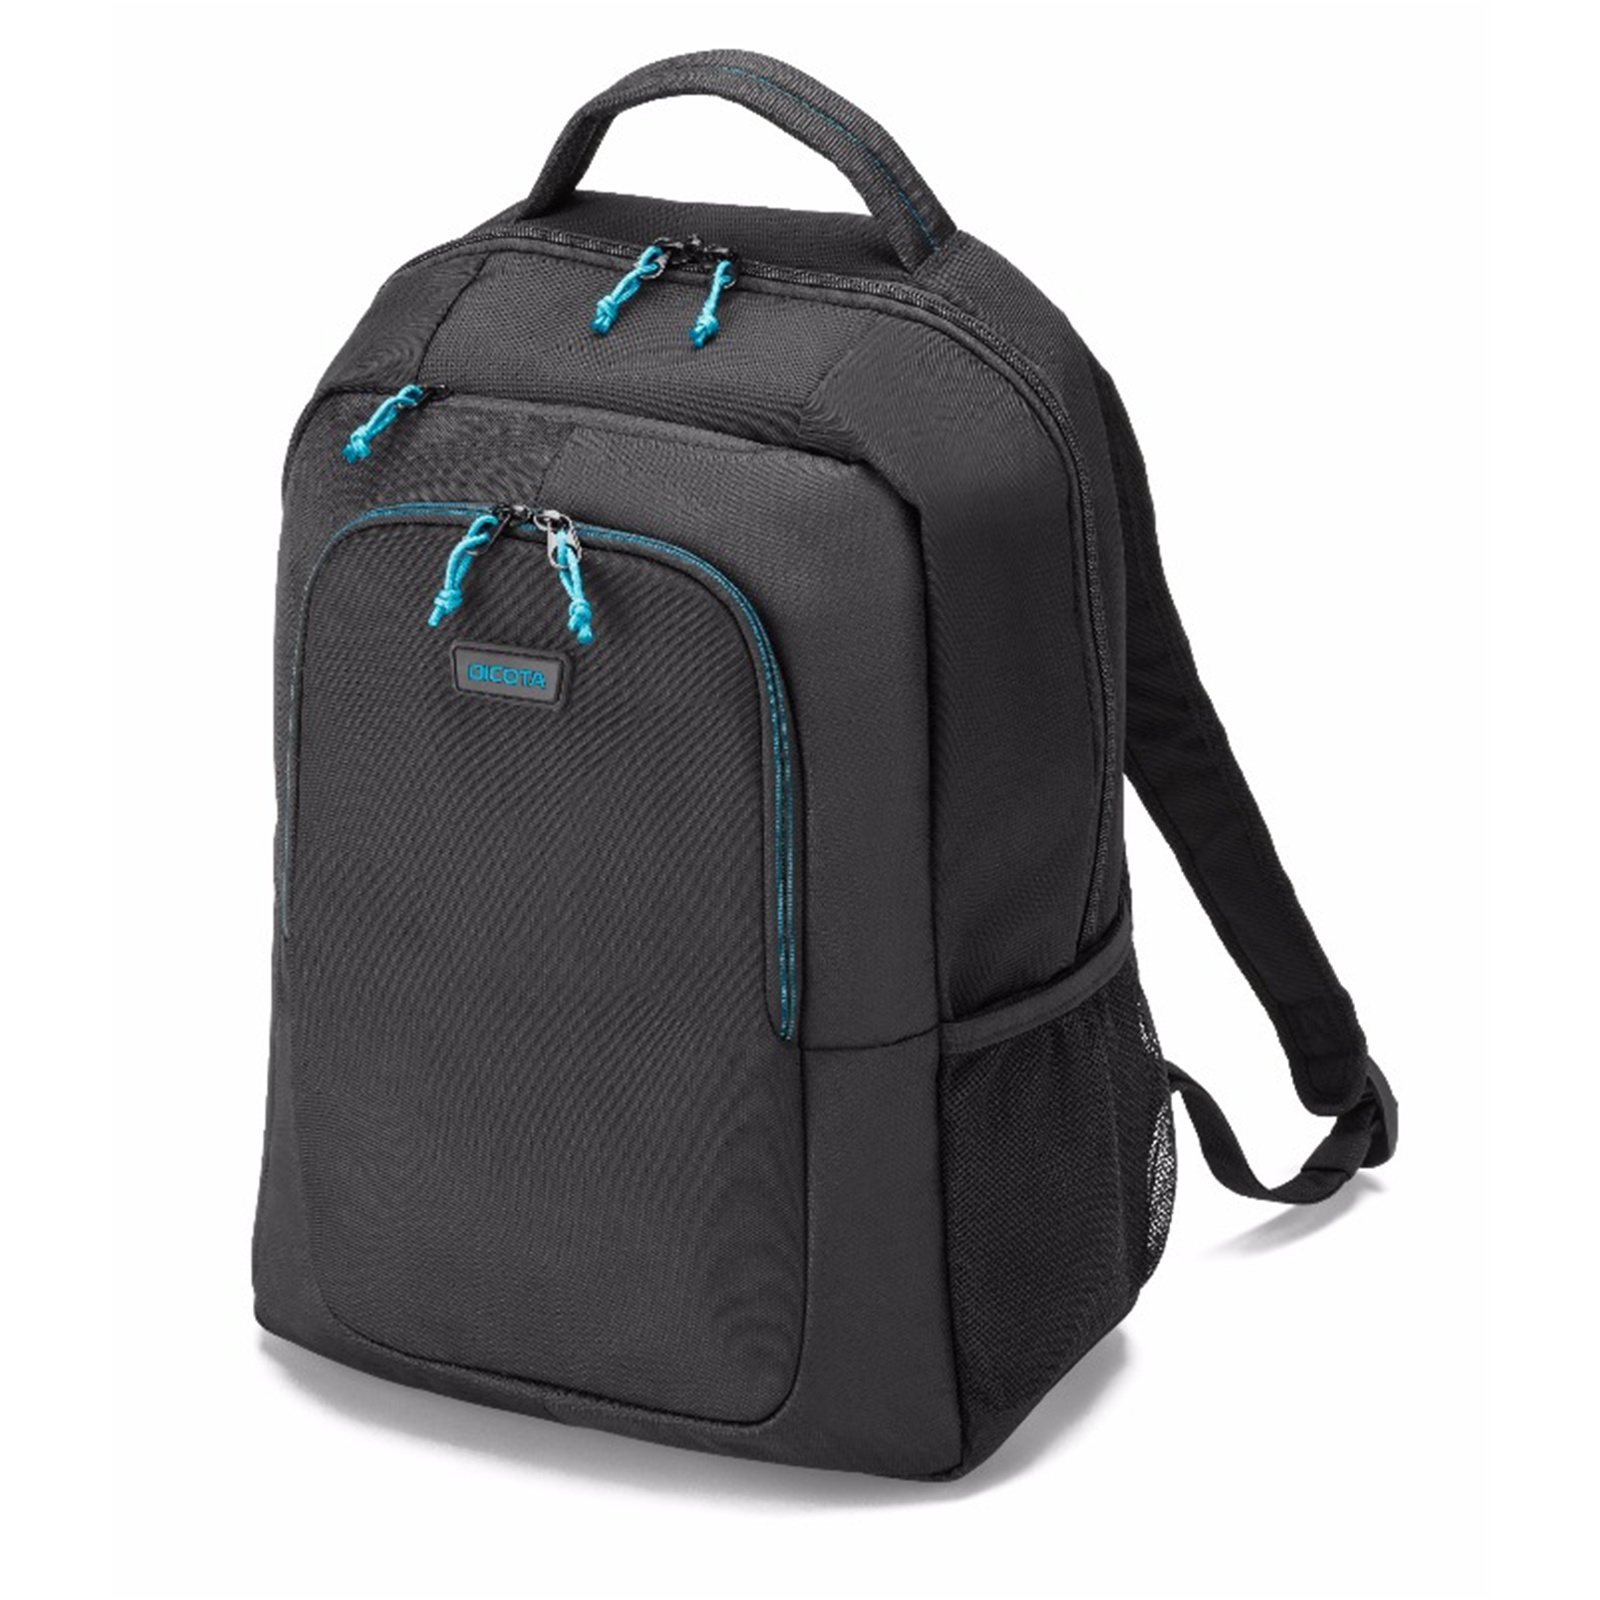 5fa0fd6d3df6 High Sierra Vex 17 Laptop Backpack- Fenix Toulouse Handball